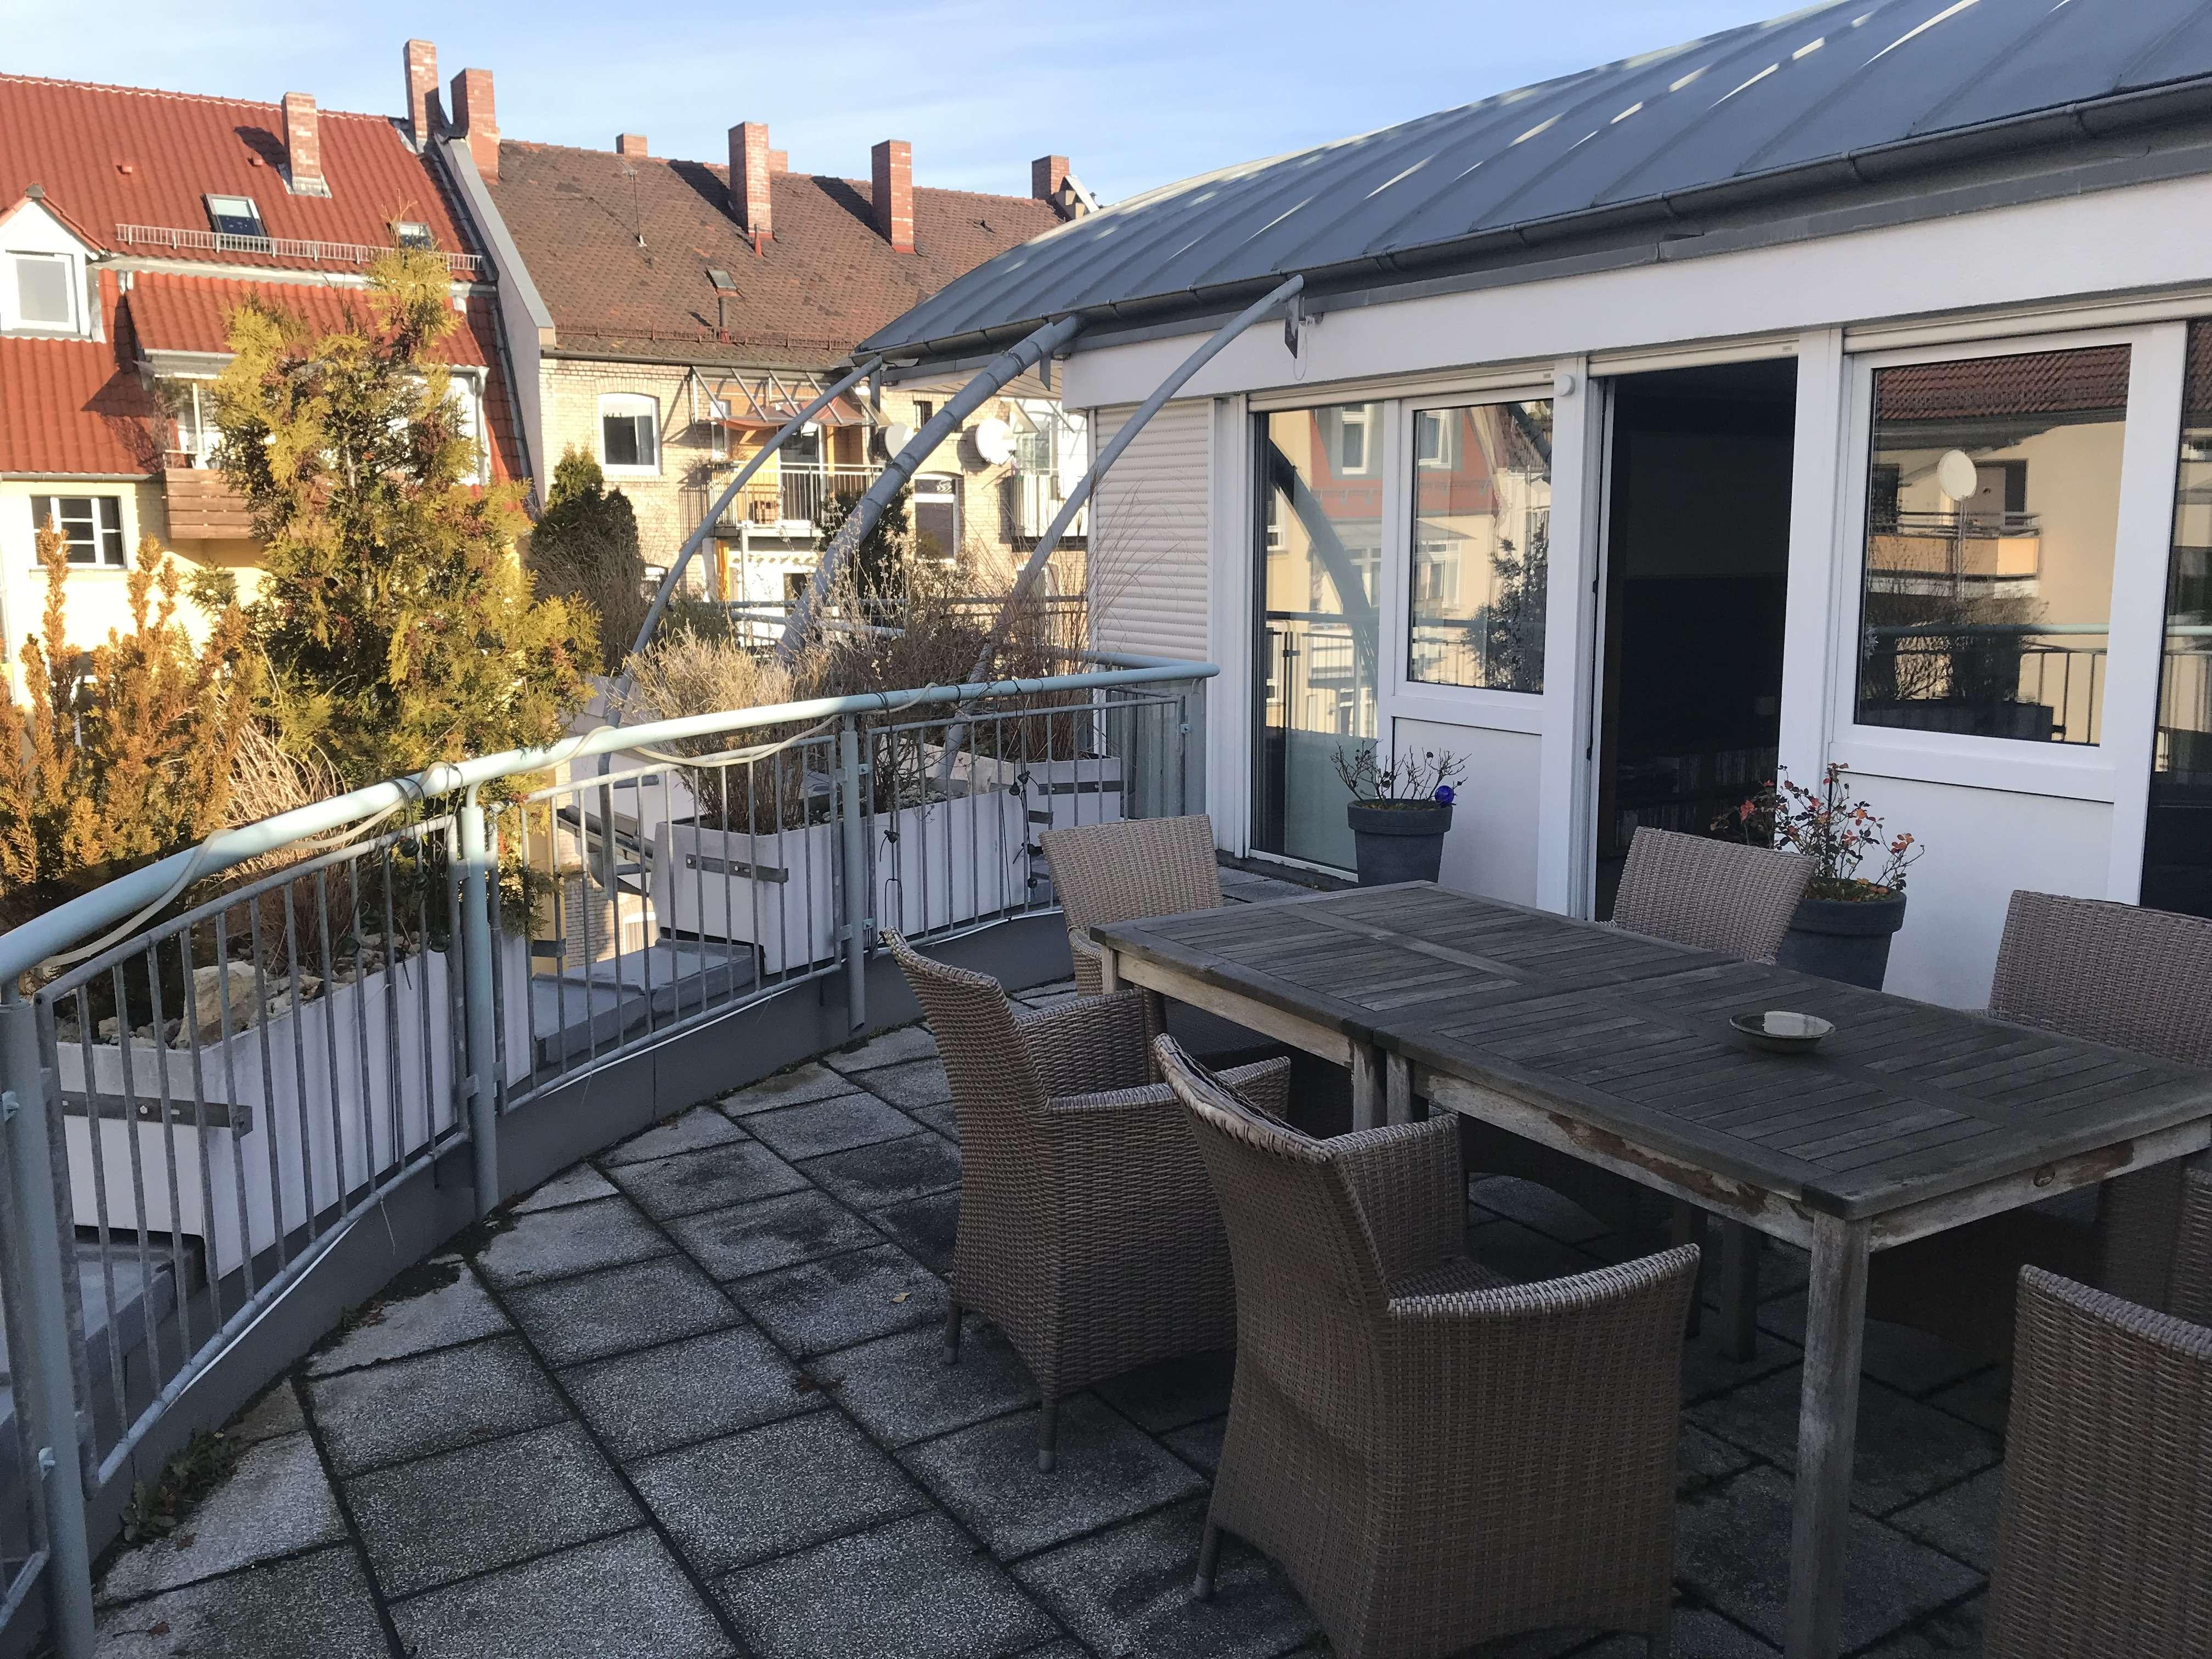 Traumhafte 3,5 Zi-Penthouse Whg in ruhiger Lage in N-Maxfeld in Maxfeld (Nürnberg)